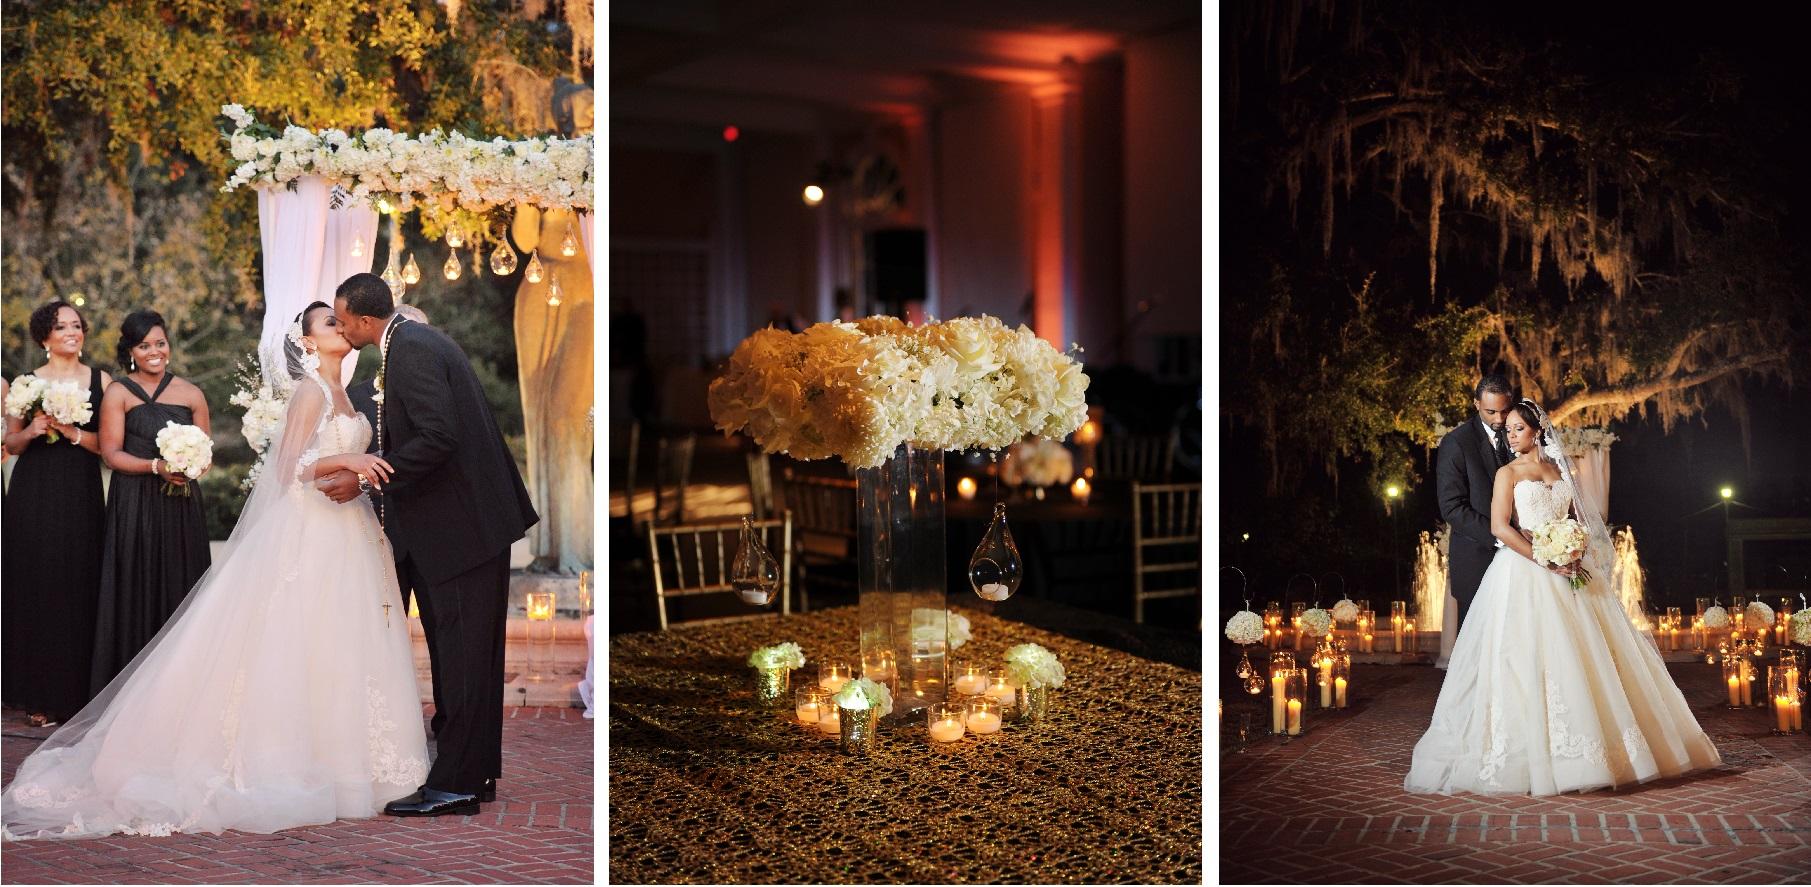 New Orleans Wedding Planning_Weddings By lulu 104.jpg